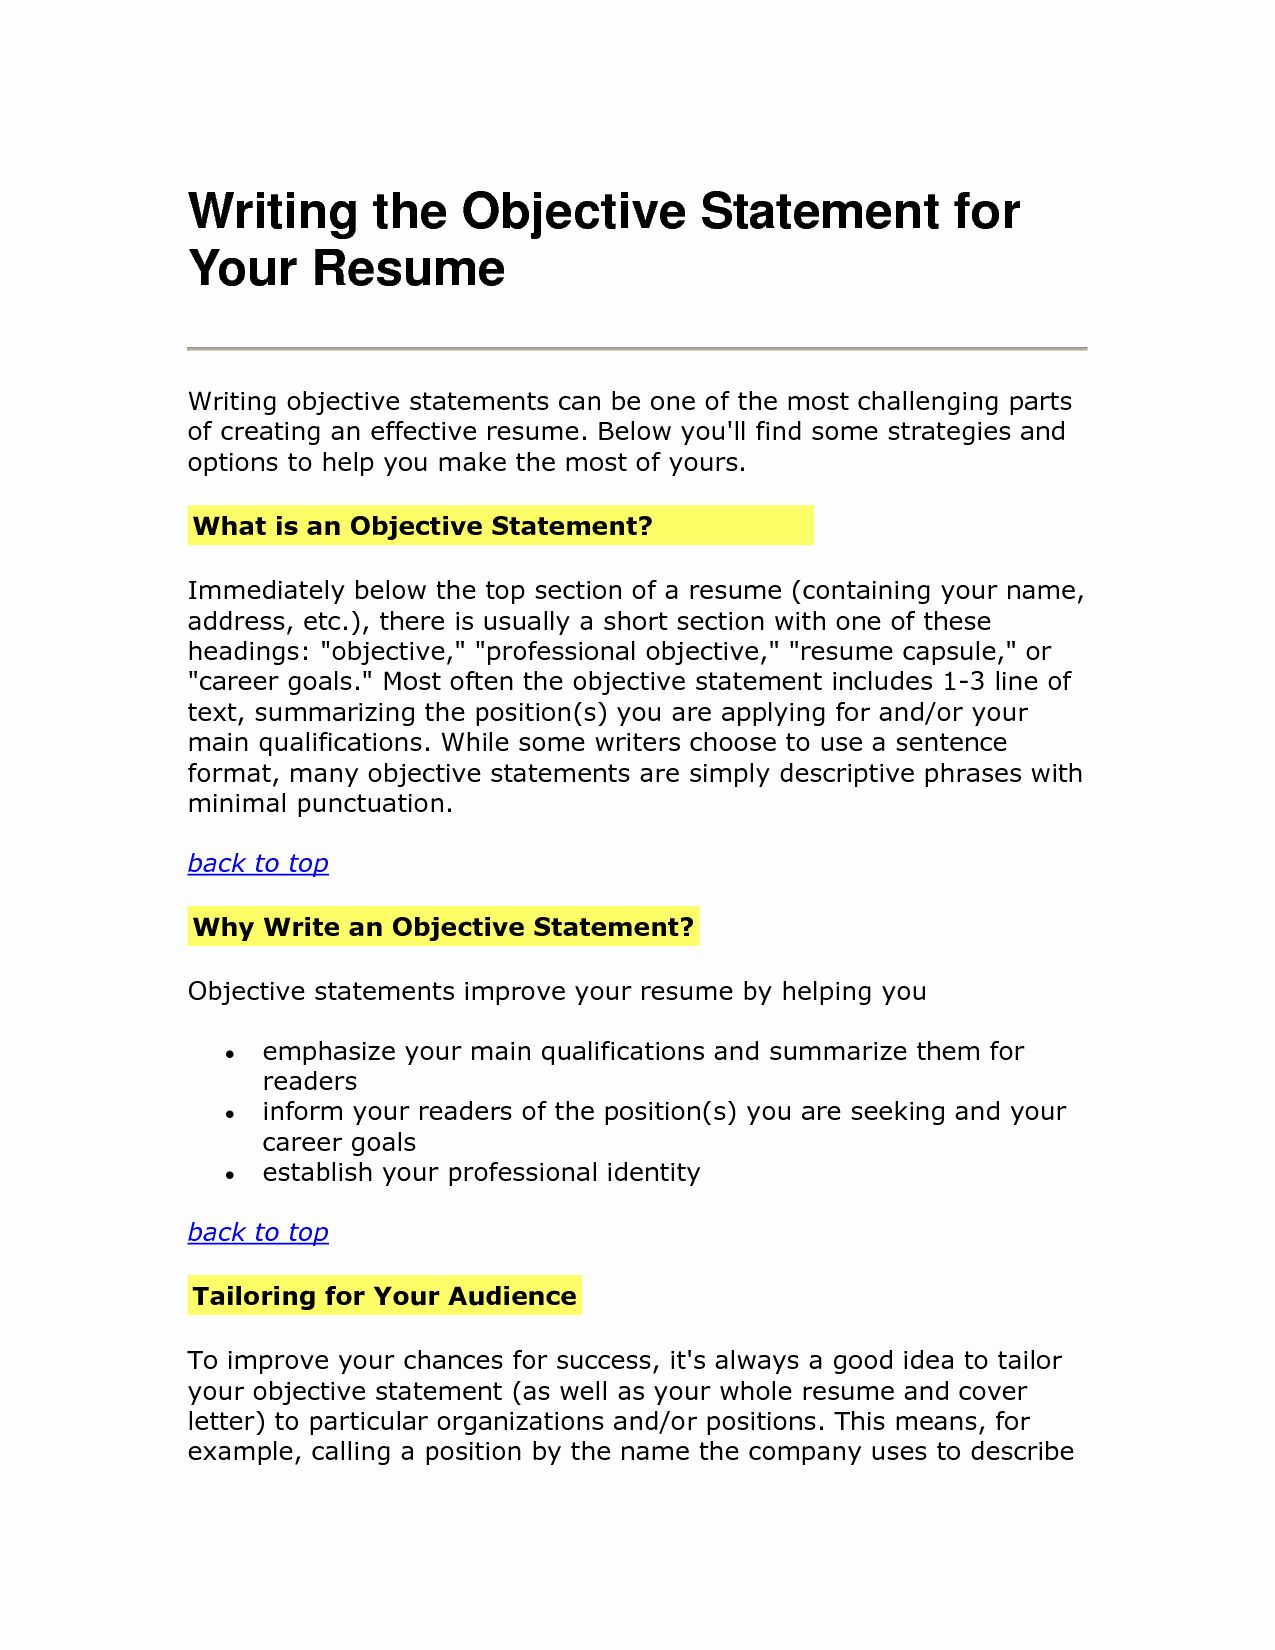 Nursing Objective Statement Resume New Resume Objective Statement Resume Objective Statement Resume Objective Statement Examples Resume Objective Examples